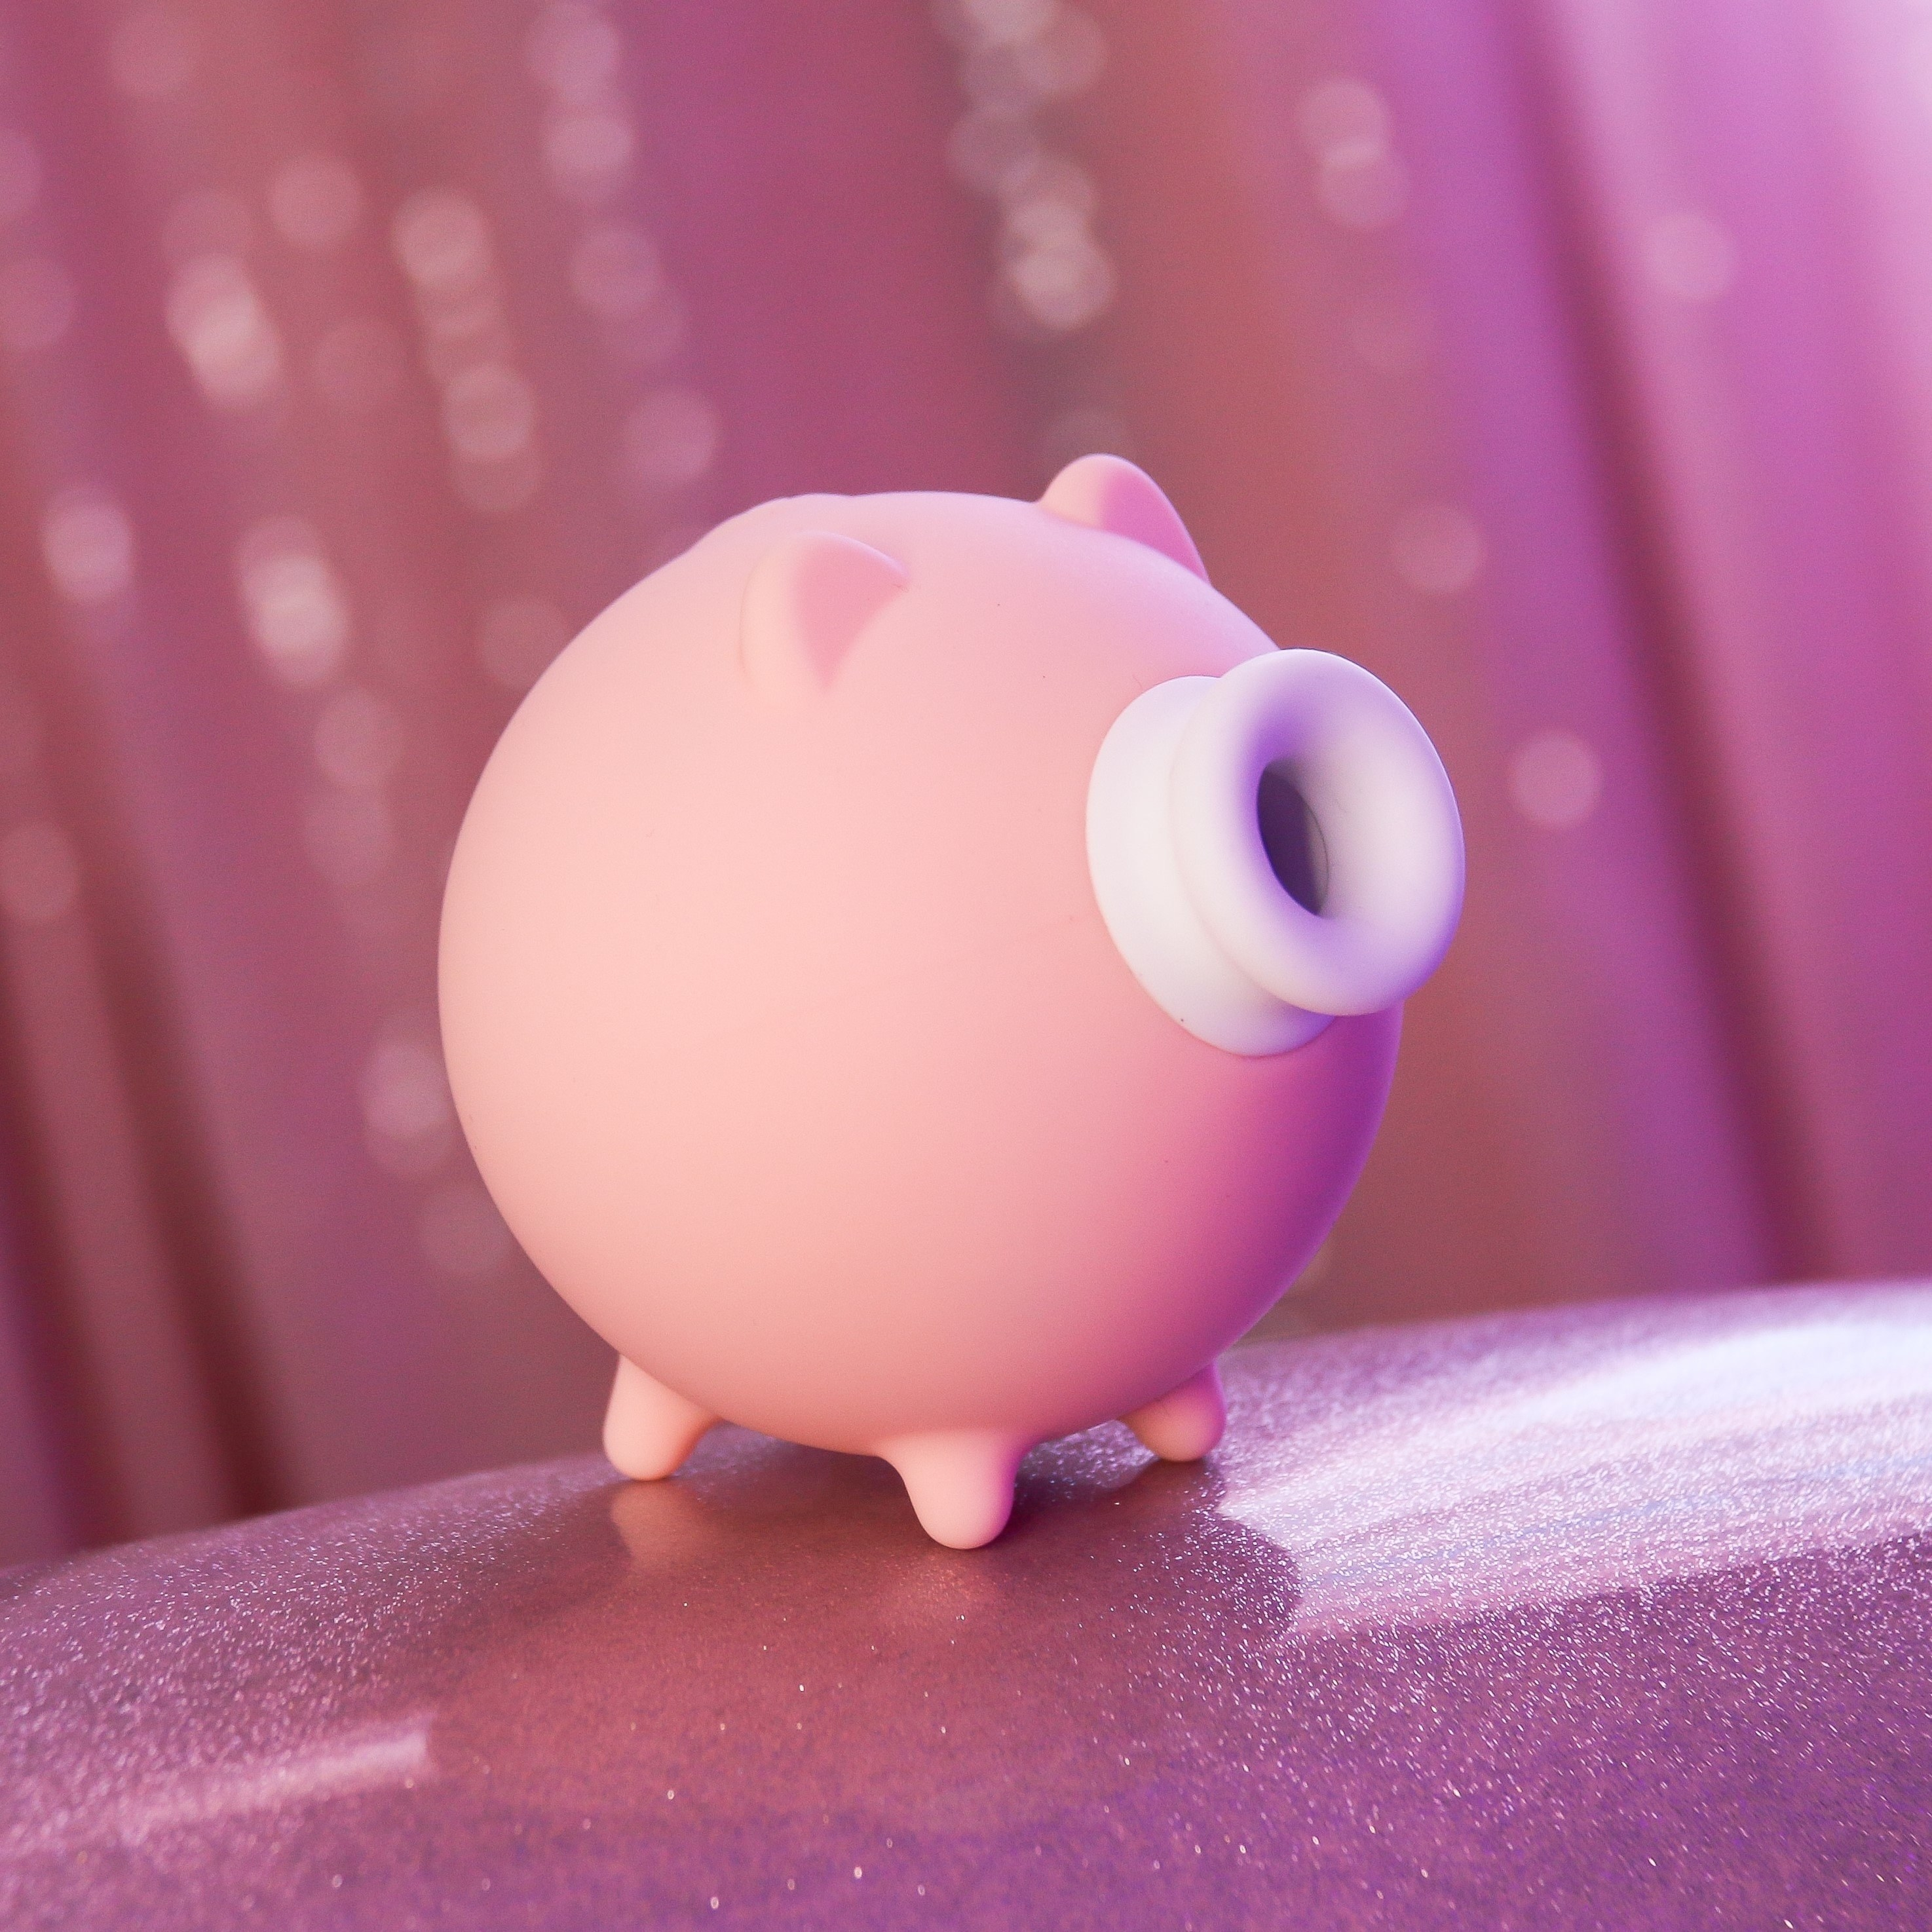 Pink pig-shaped suction vibrator